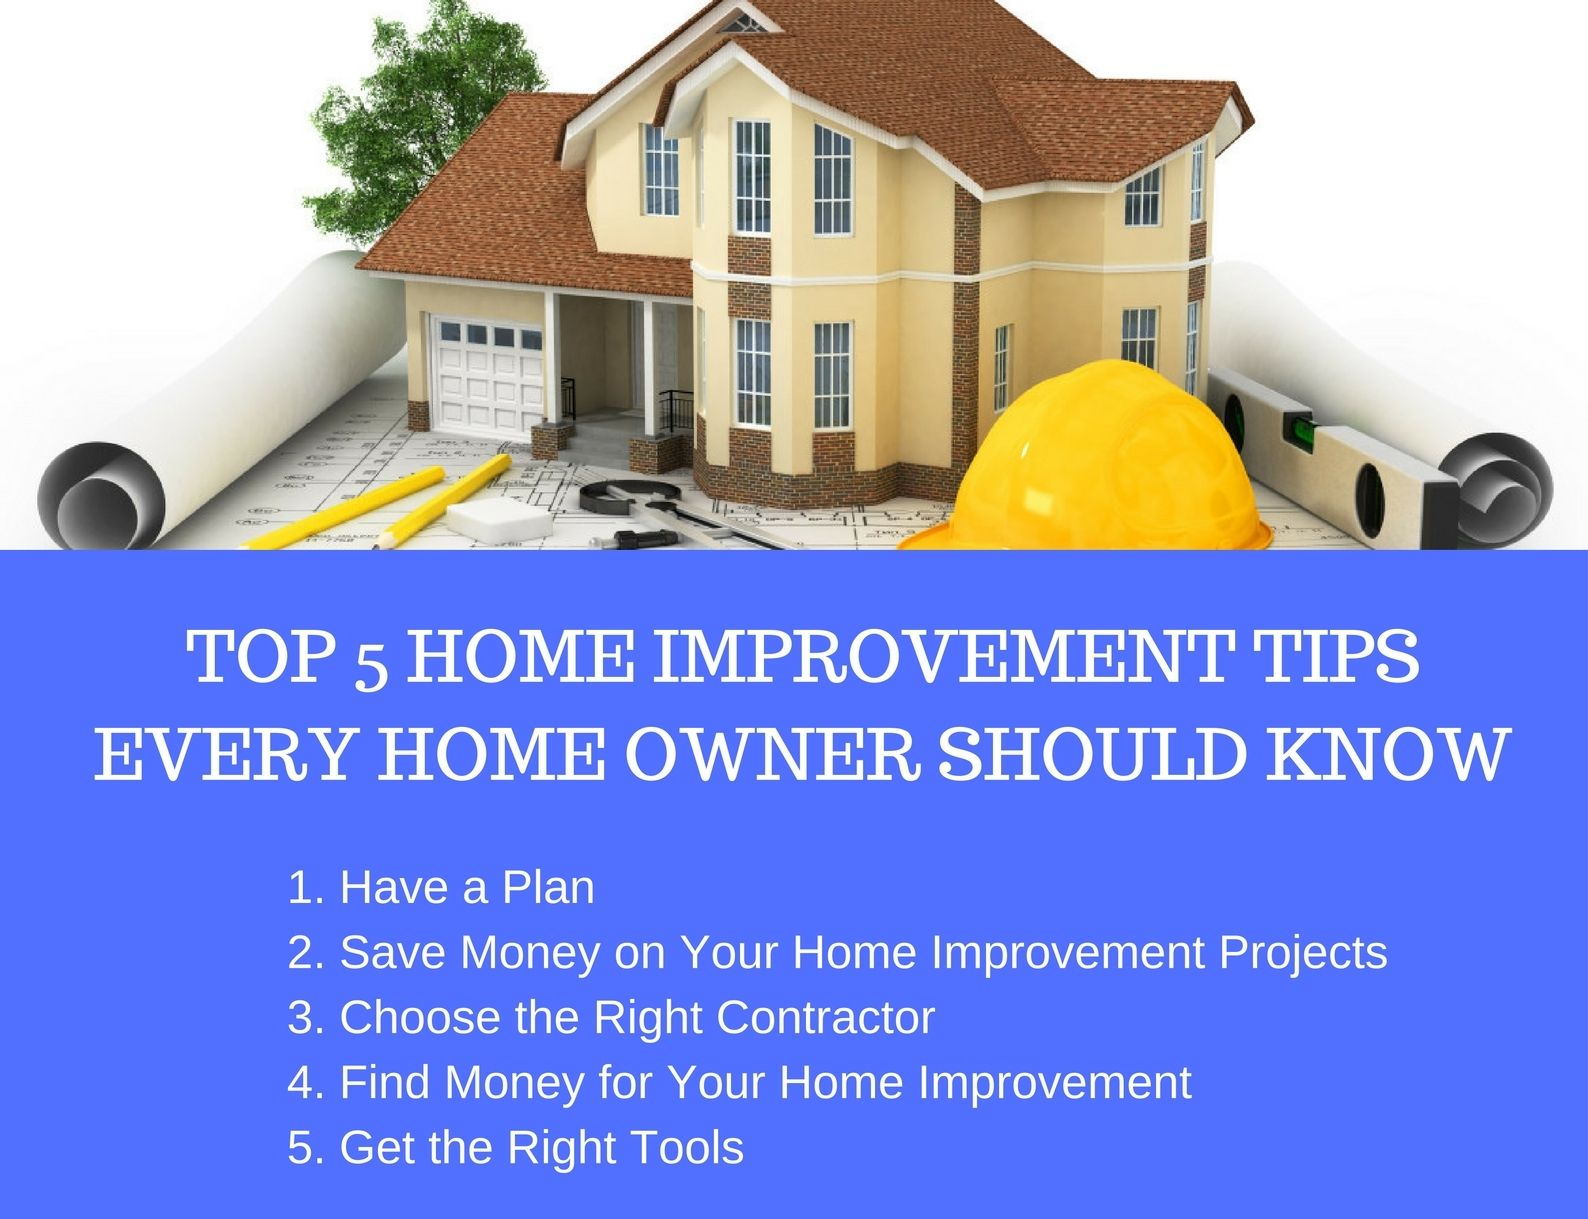 Homeimprovements Property Guwahati Assam Skre Skrealtors